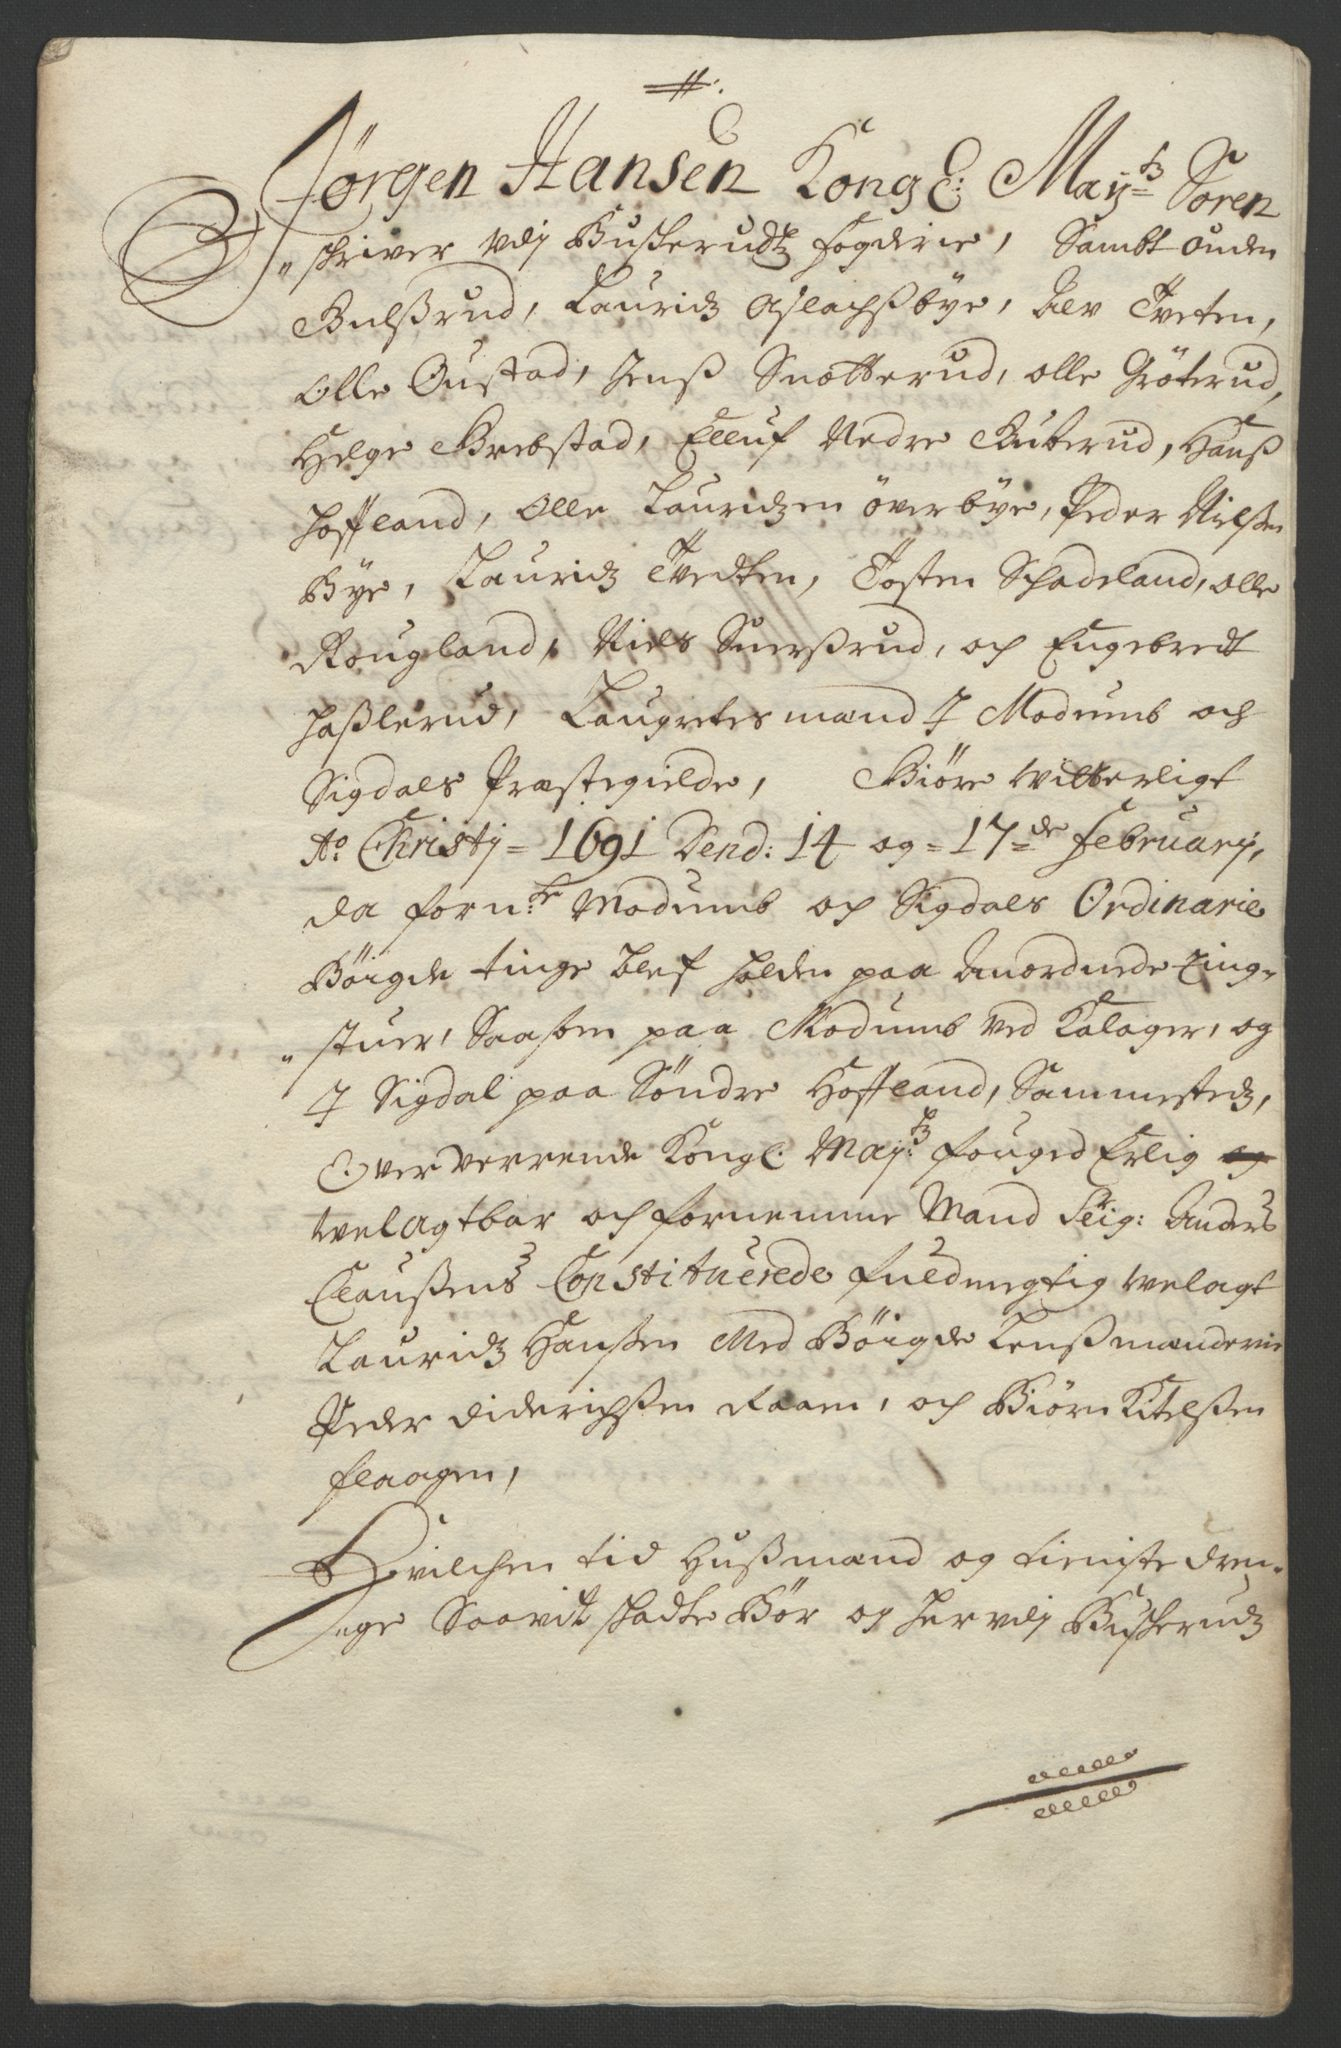 RA, Rentekammeret inntil 1814, Reviderte regnskaper, Fogderegnskap, R25/L1681: Fogderegnskap Buskerud, 1691-1692, s. 202